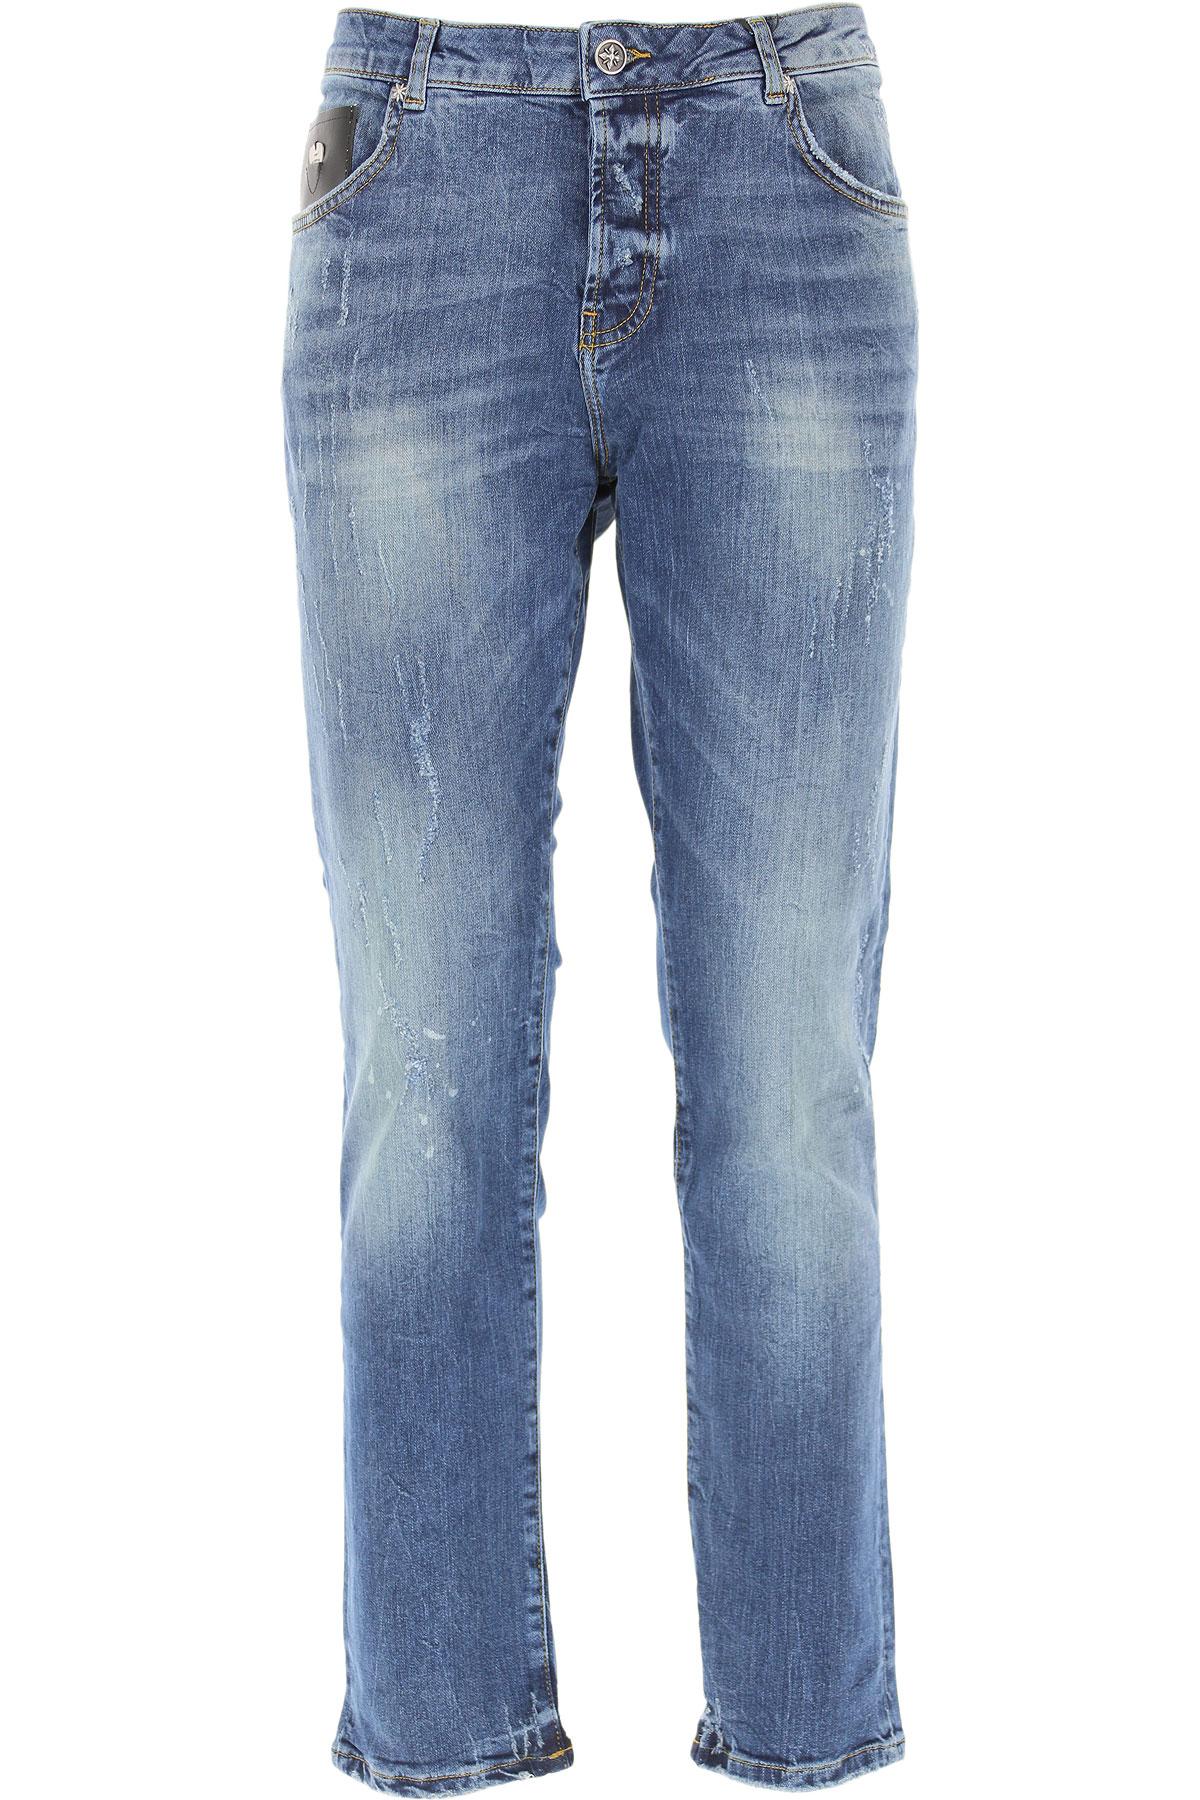 John Richmond Jeans On Sale, Denim Blue, Cotton, 2019, 30 32 34 36